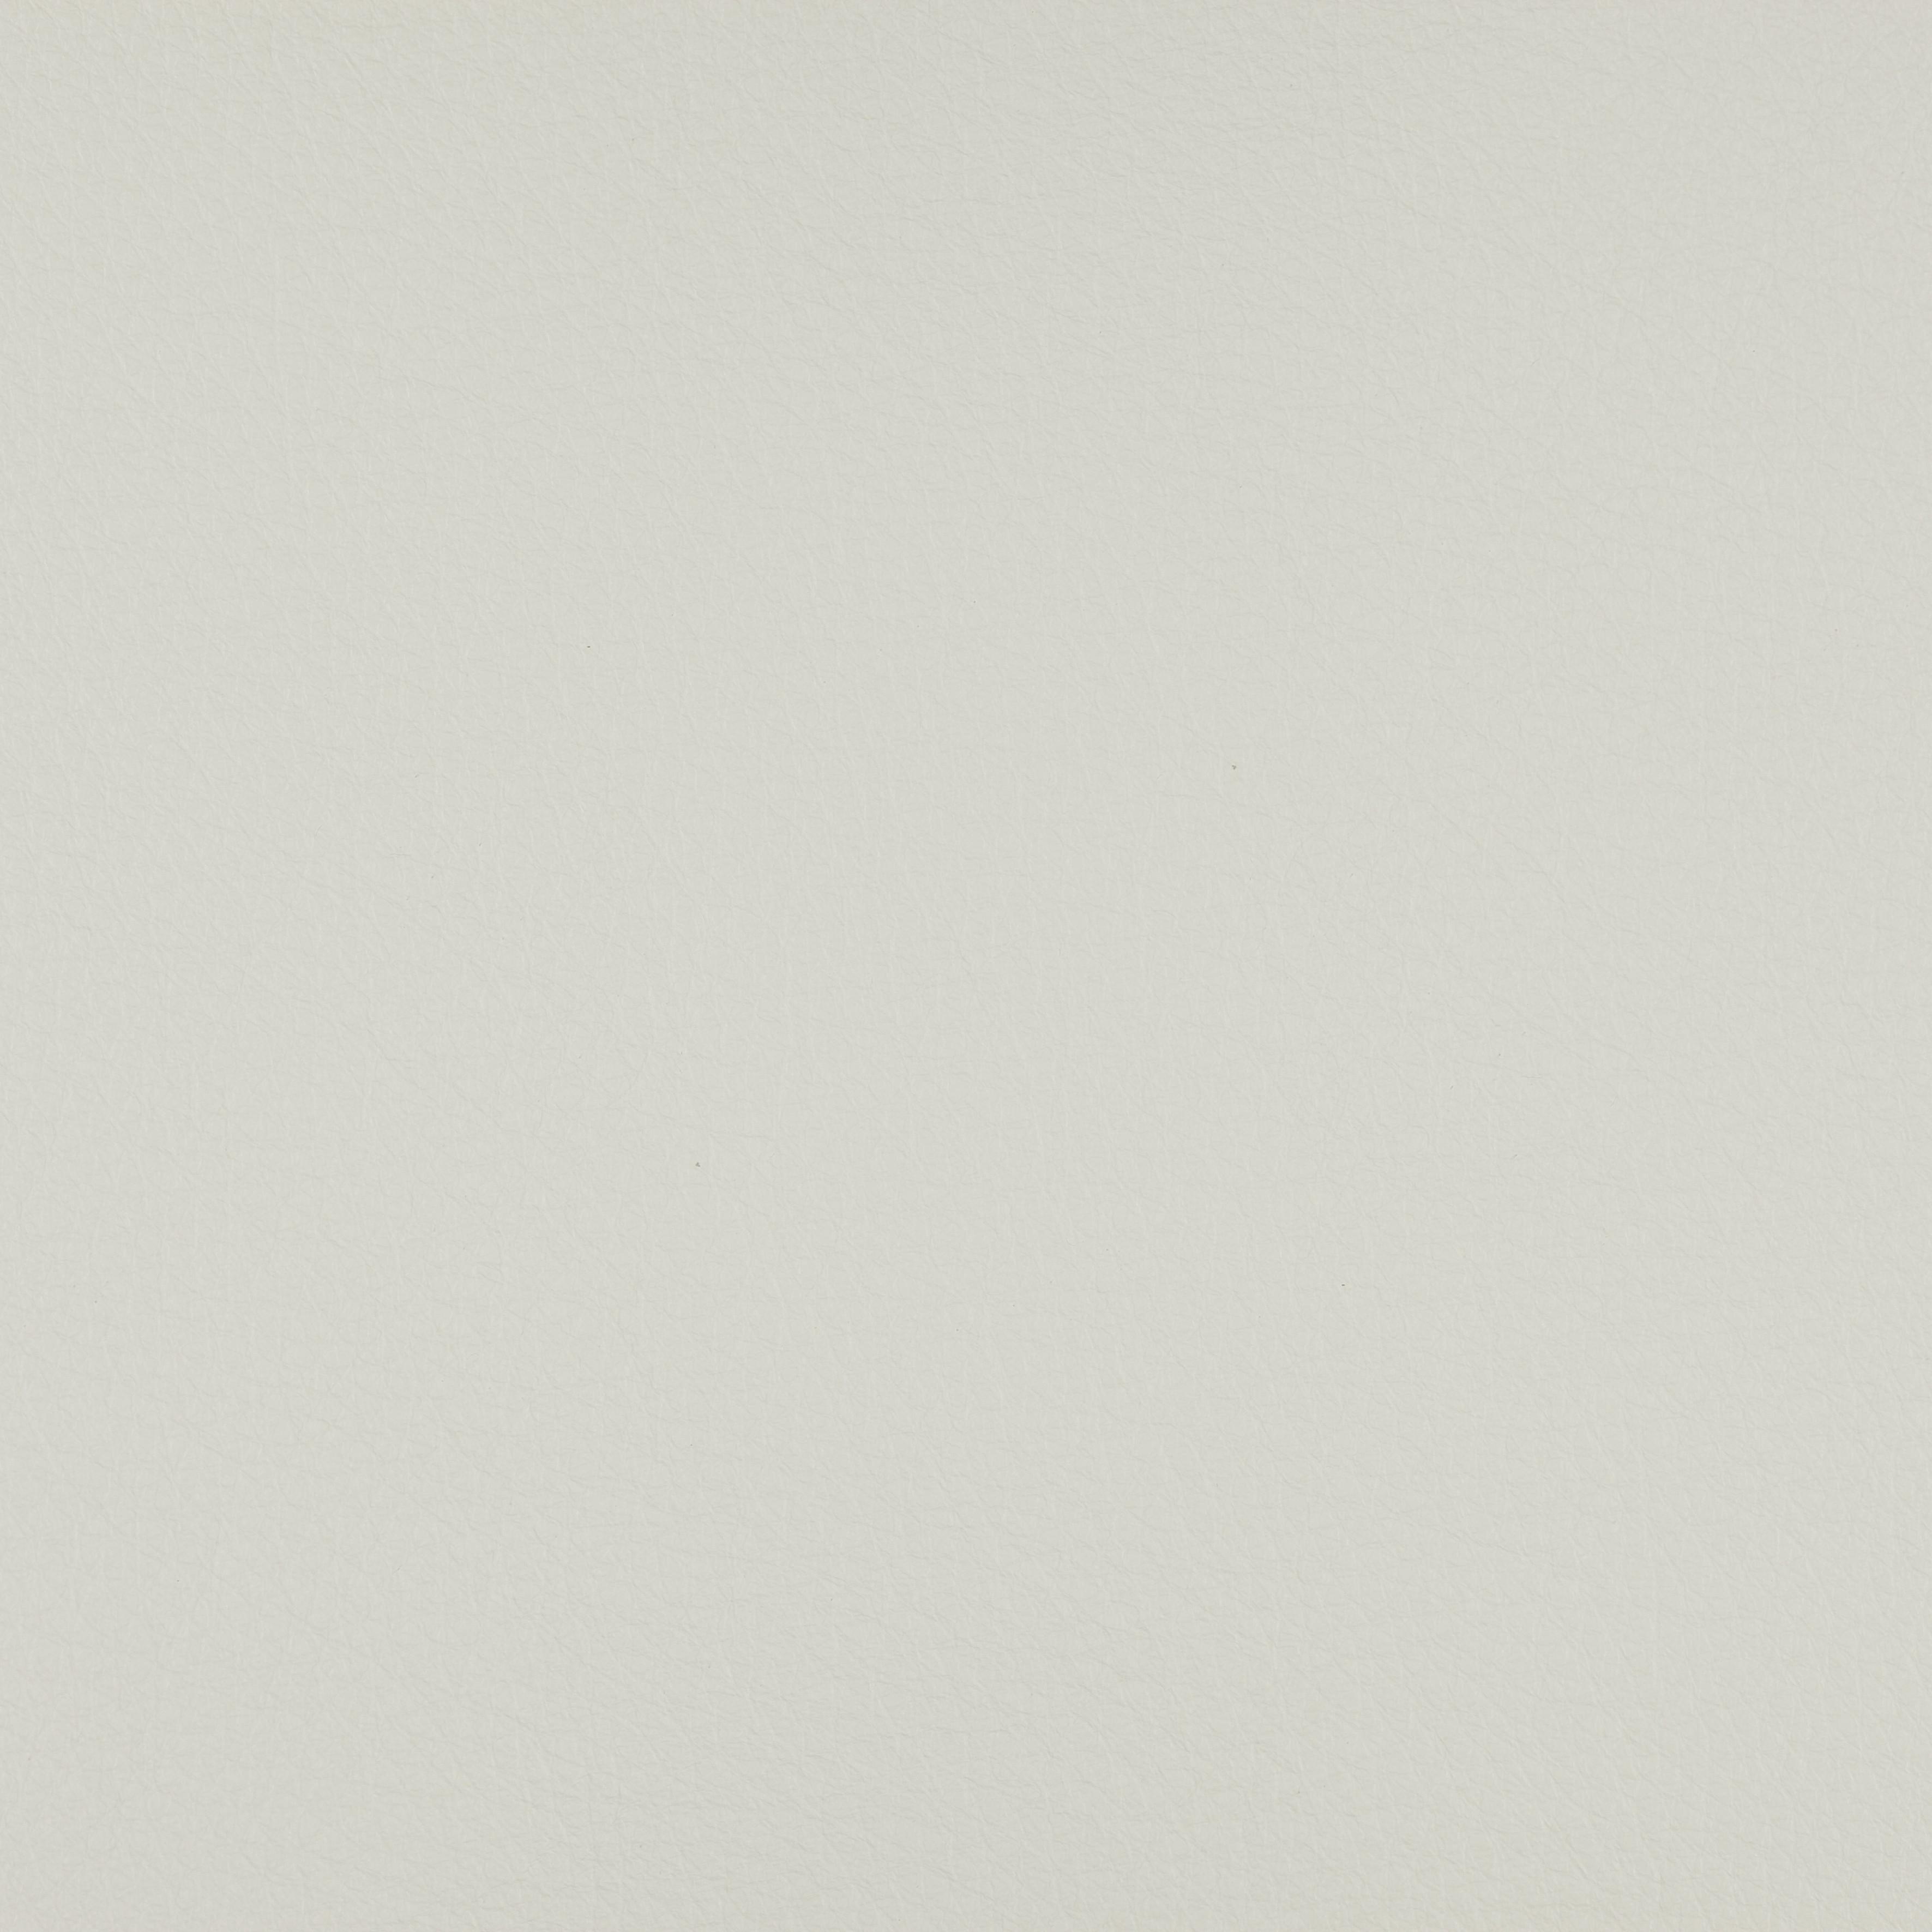 EXTRA 13Y286 Bianco Sporco